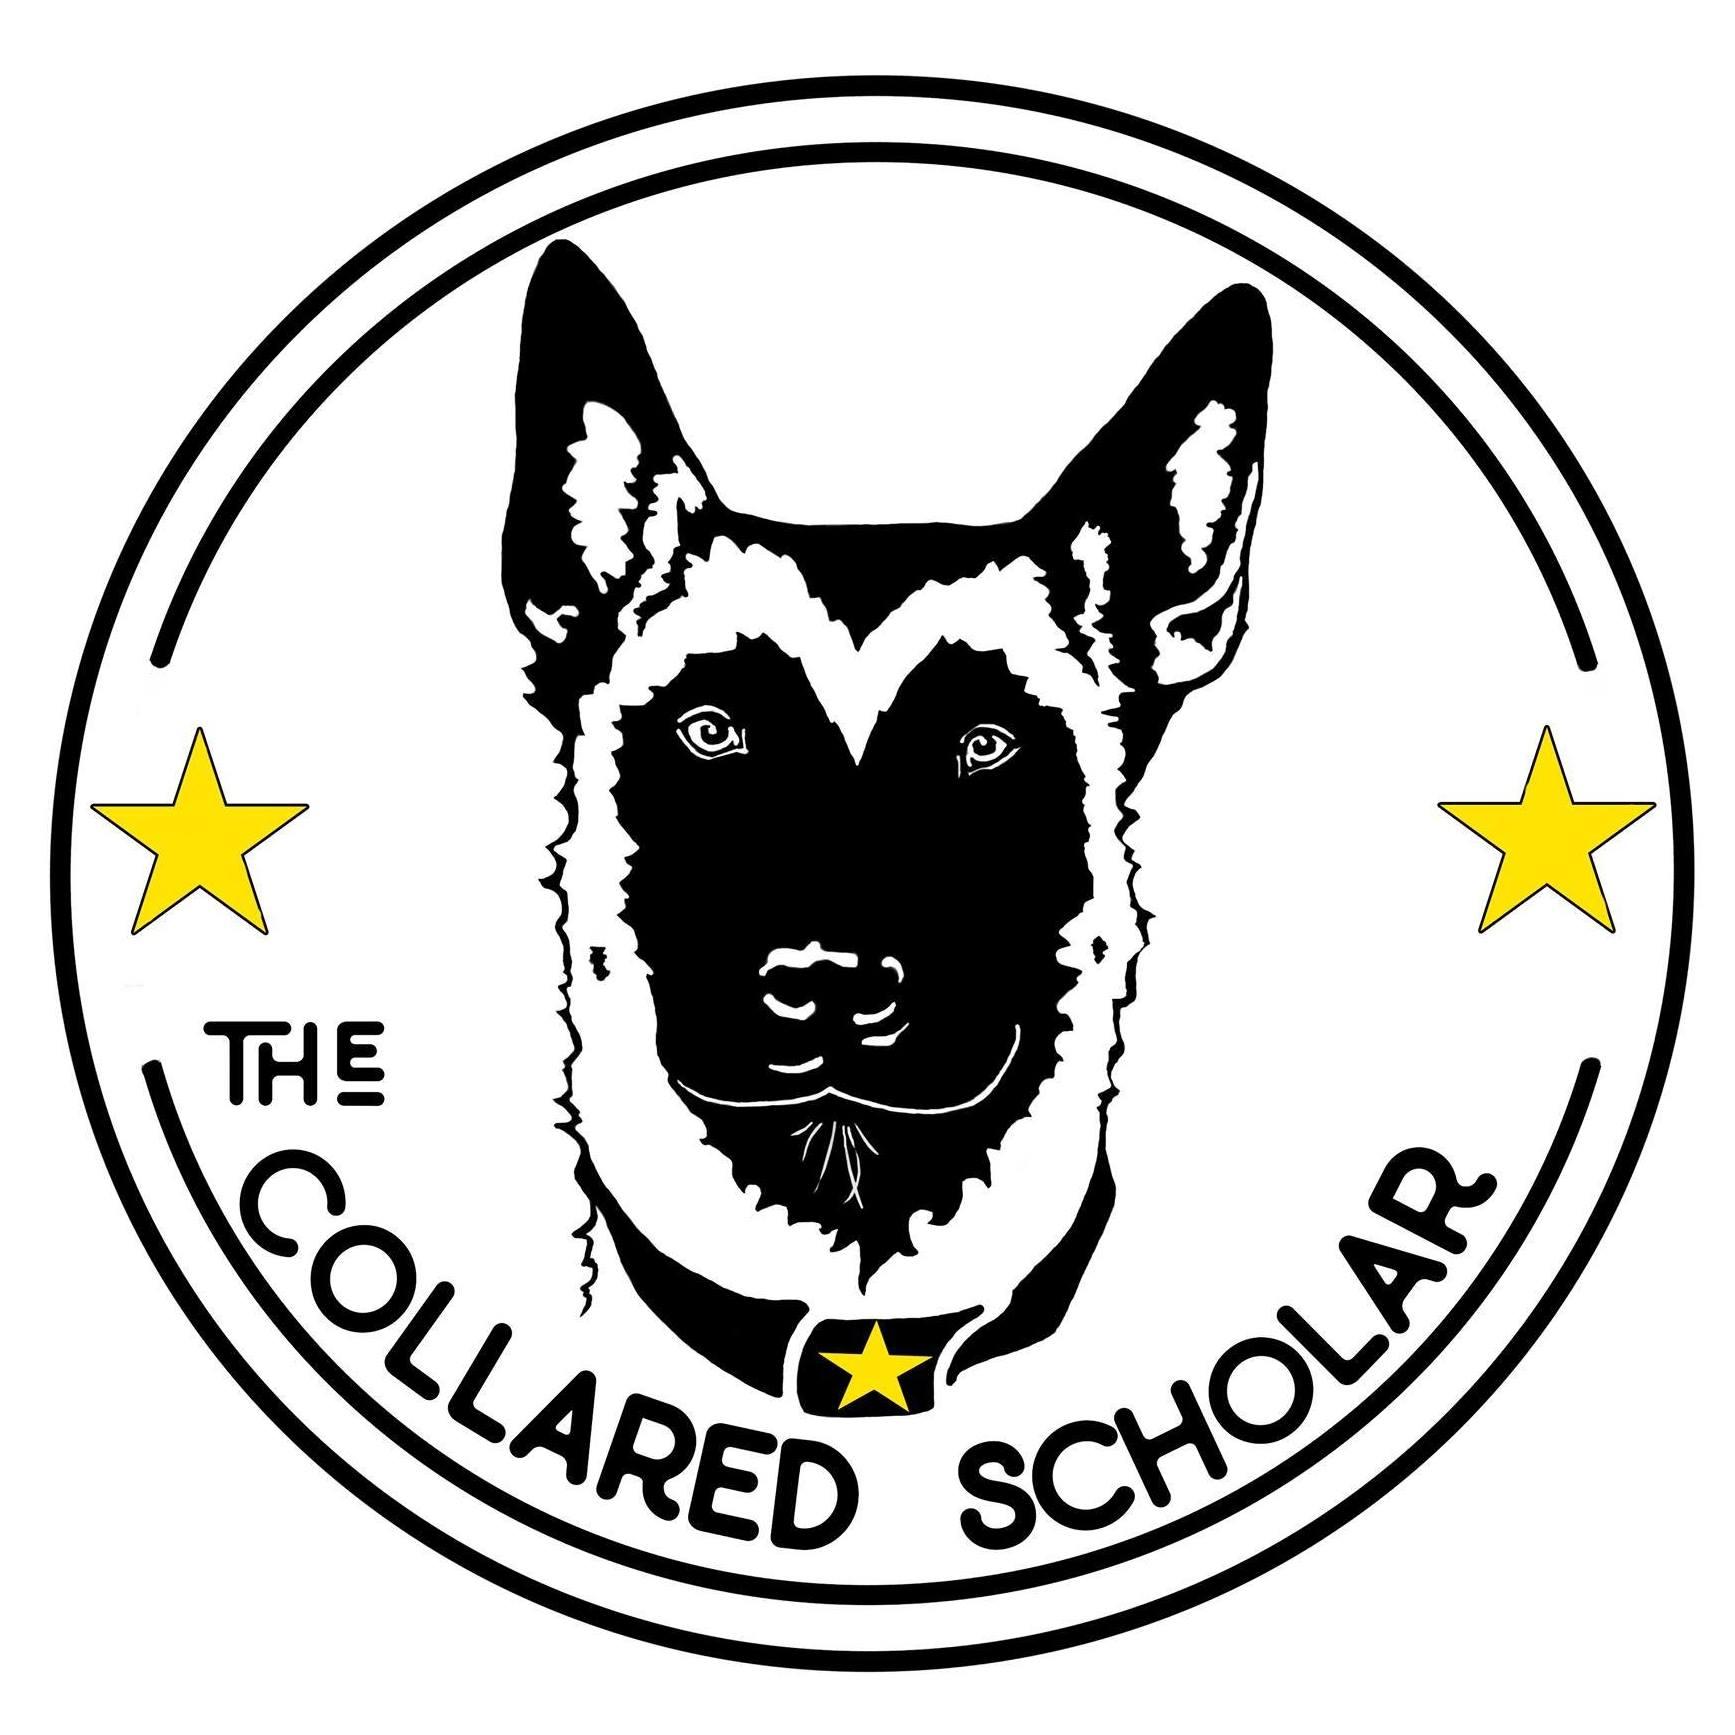 www.collared-scholar.com